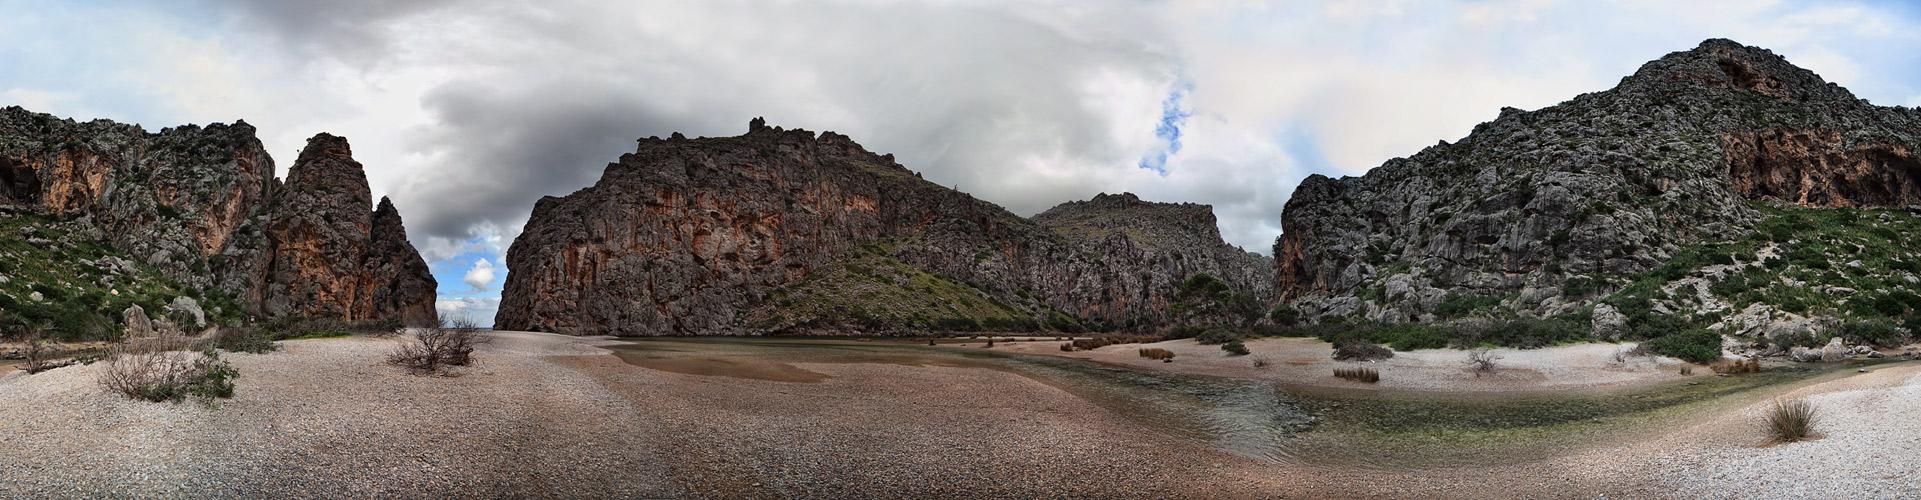 PANORAMA 360 ° - Torrent de Pareis (reload)